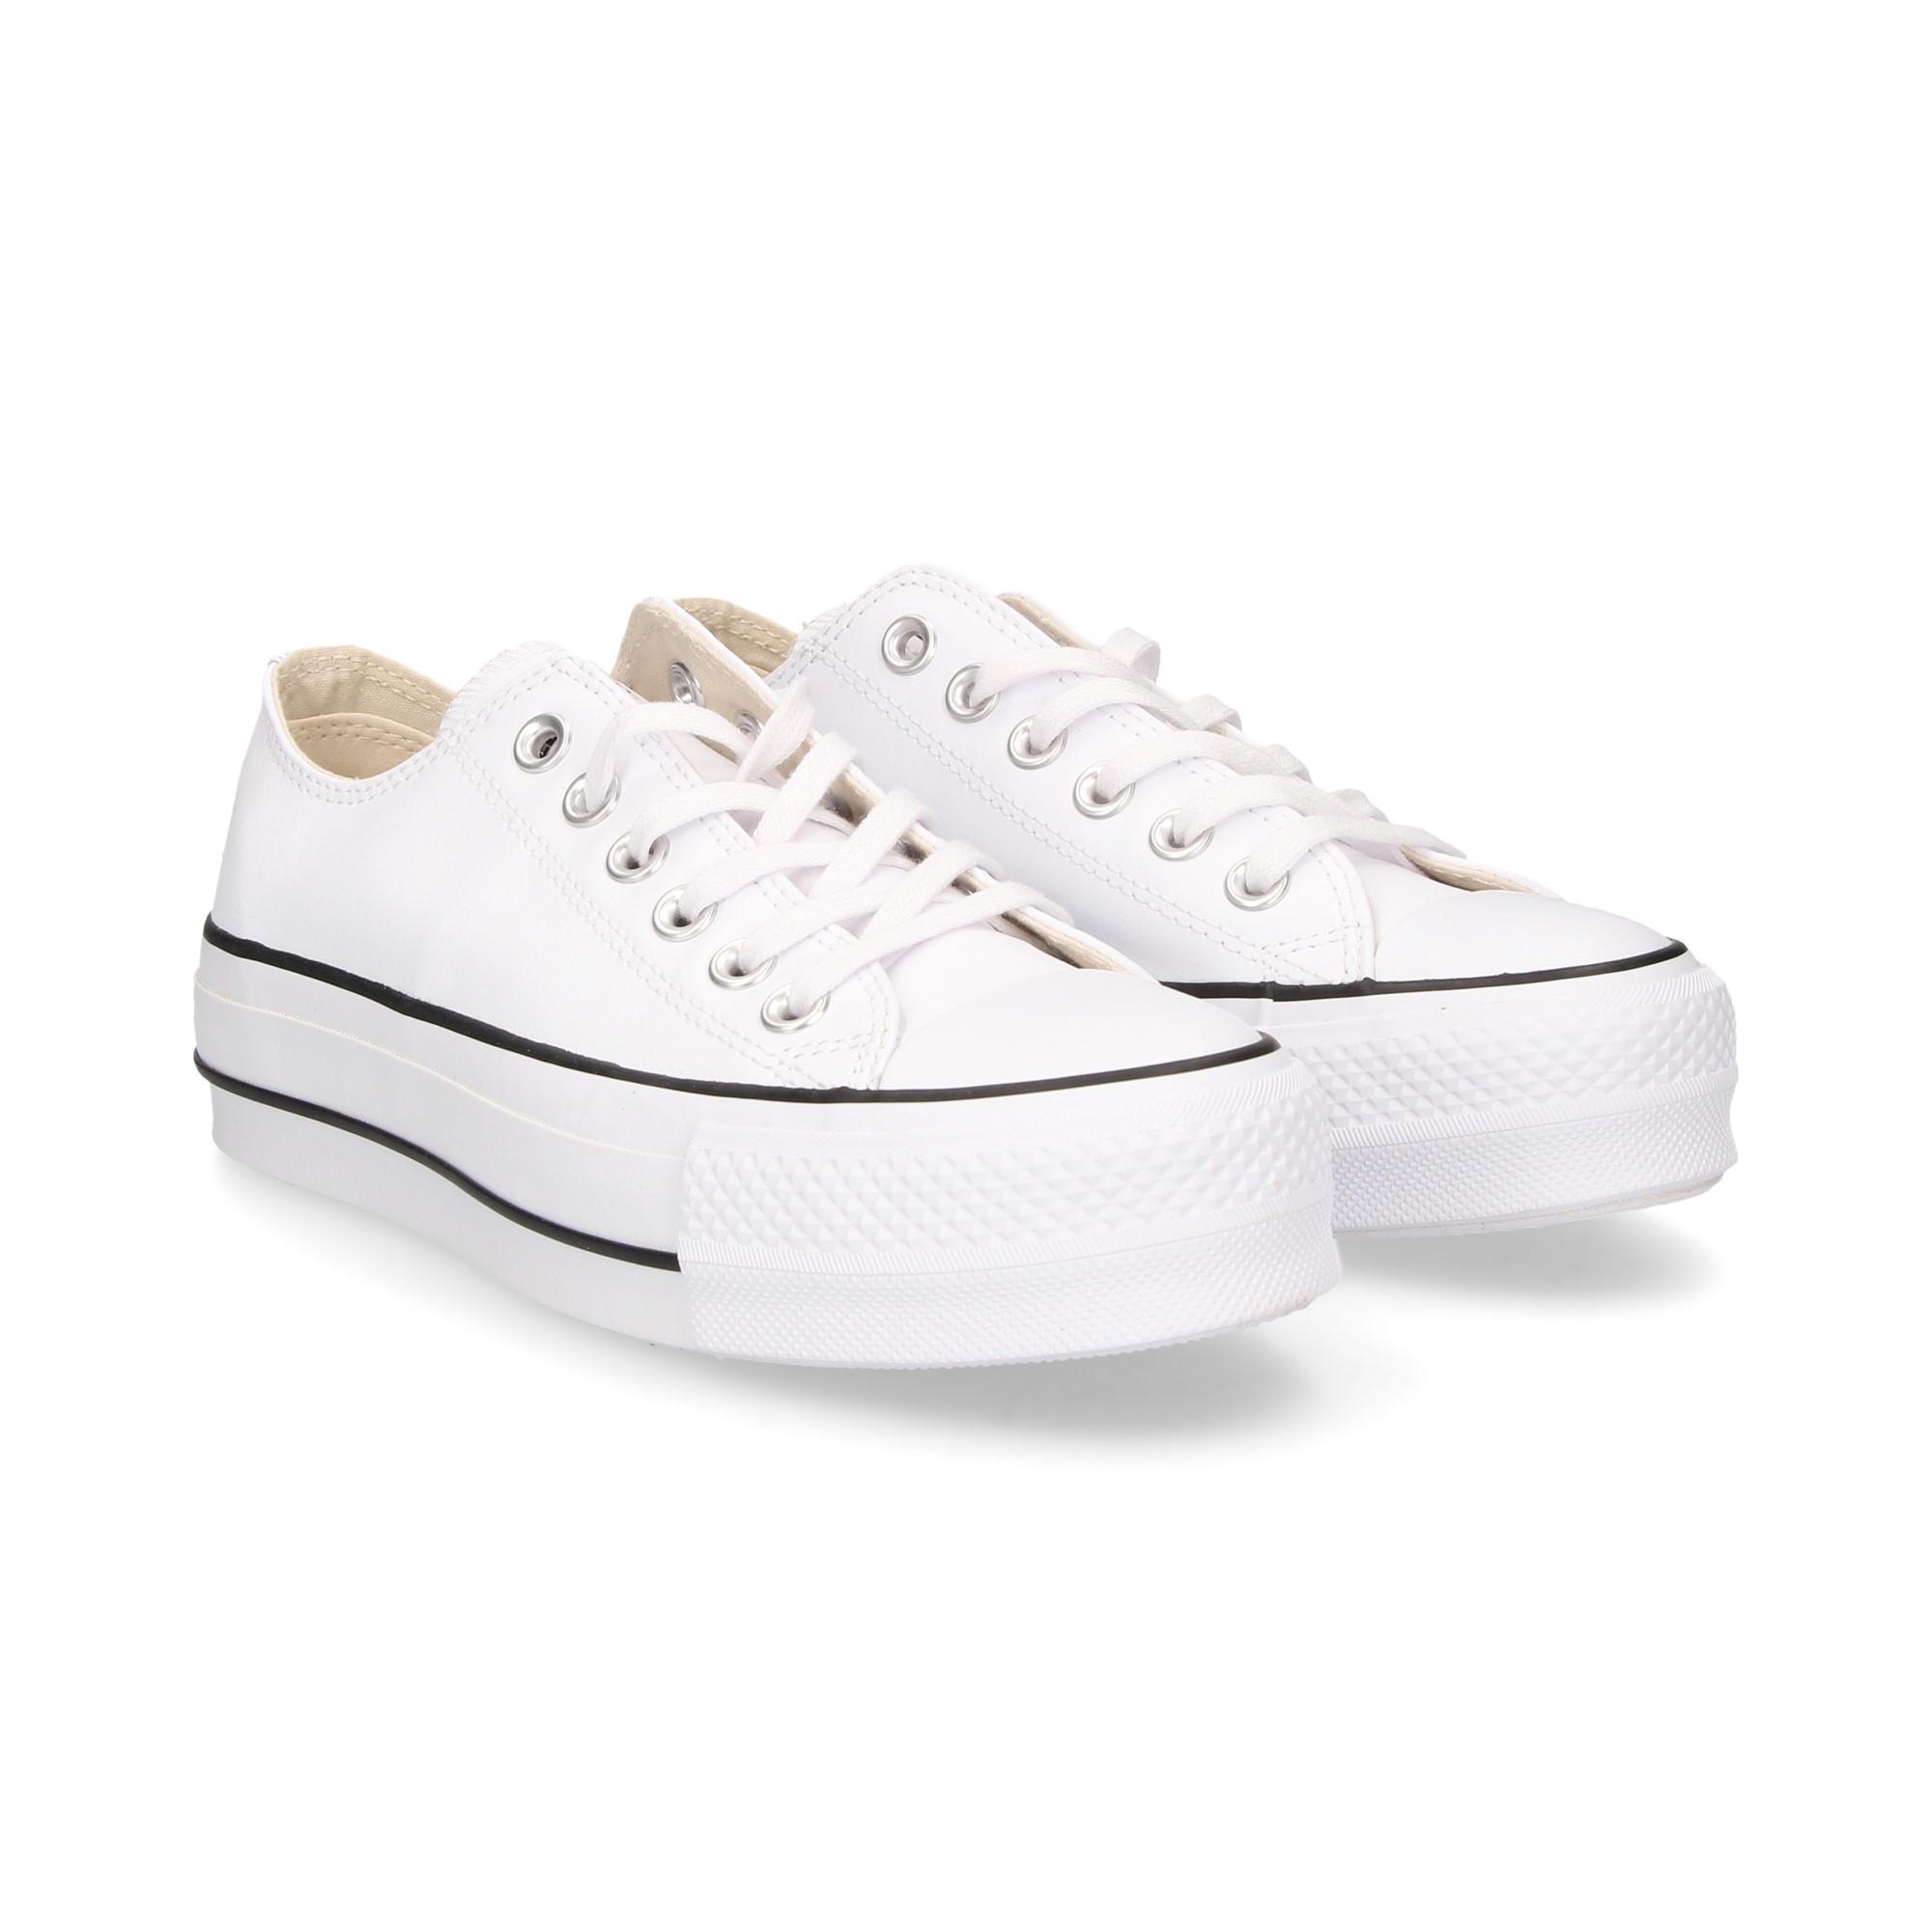 ee75d6a7606e CONVERSE Women s Sneakers 561680C 102 WHITE